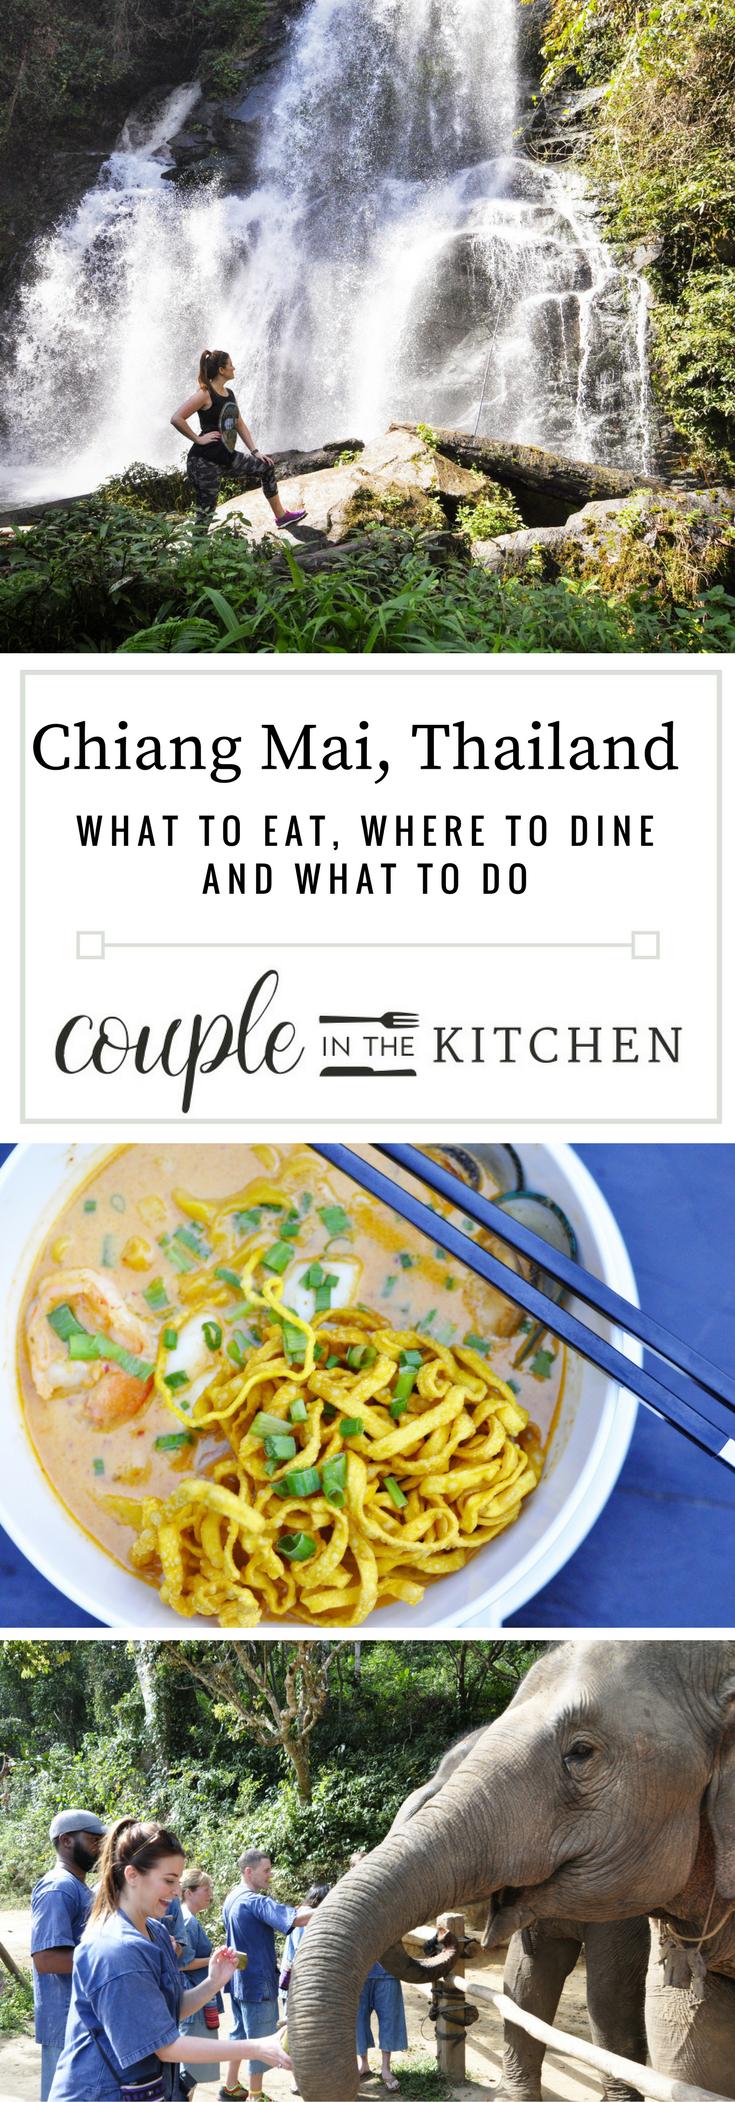 What to do in Chiang Mai Thailand | coupleinthekitchen.com